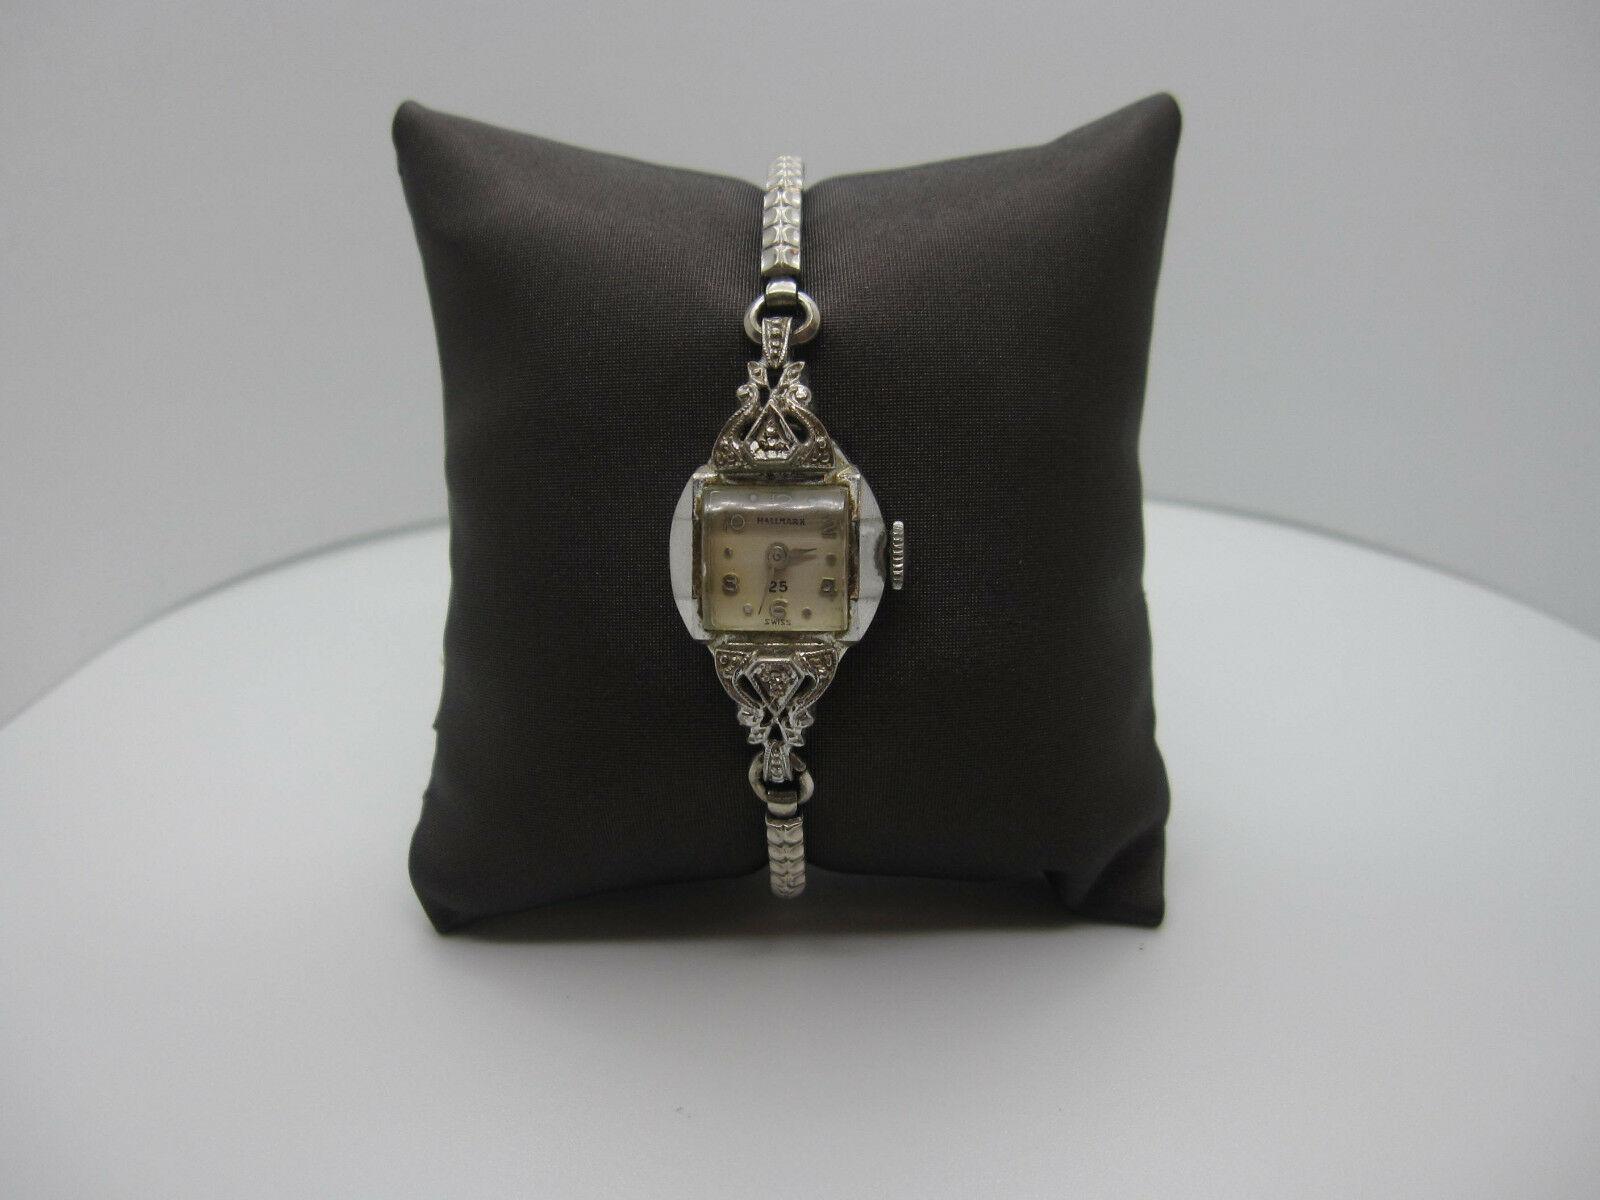 Vintage Women's Hallmark 25 Jewels 10k Rolled Gold Plated Hand Wind Watch